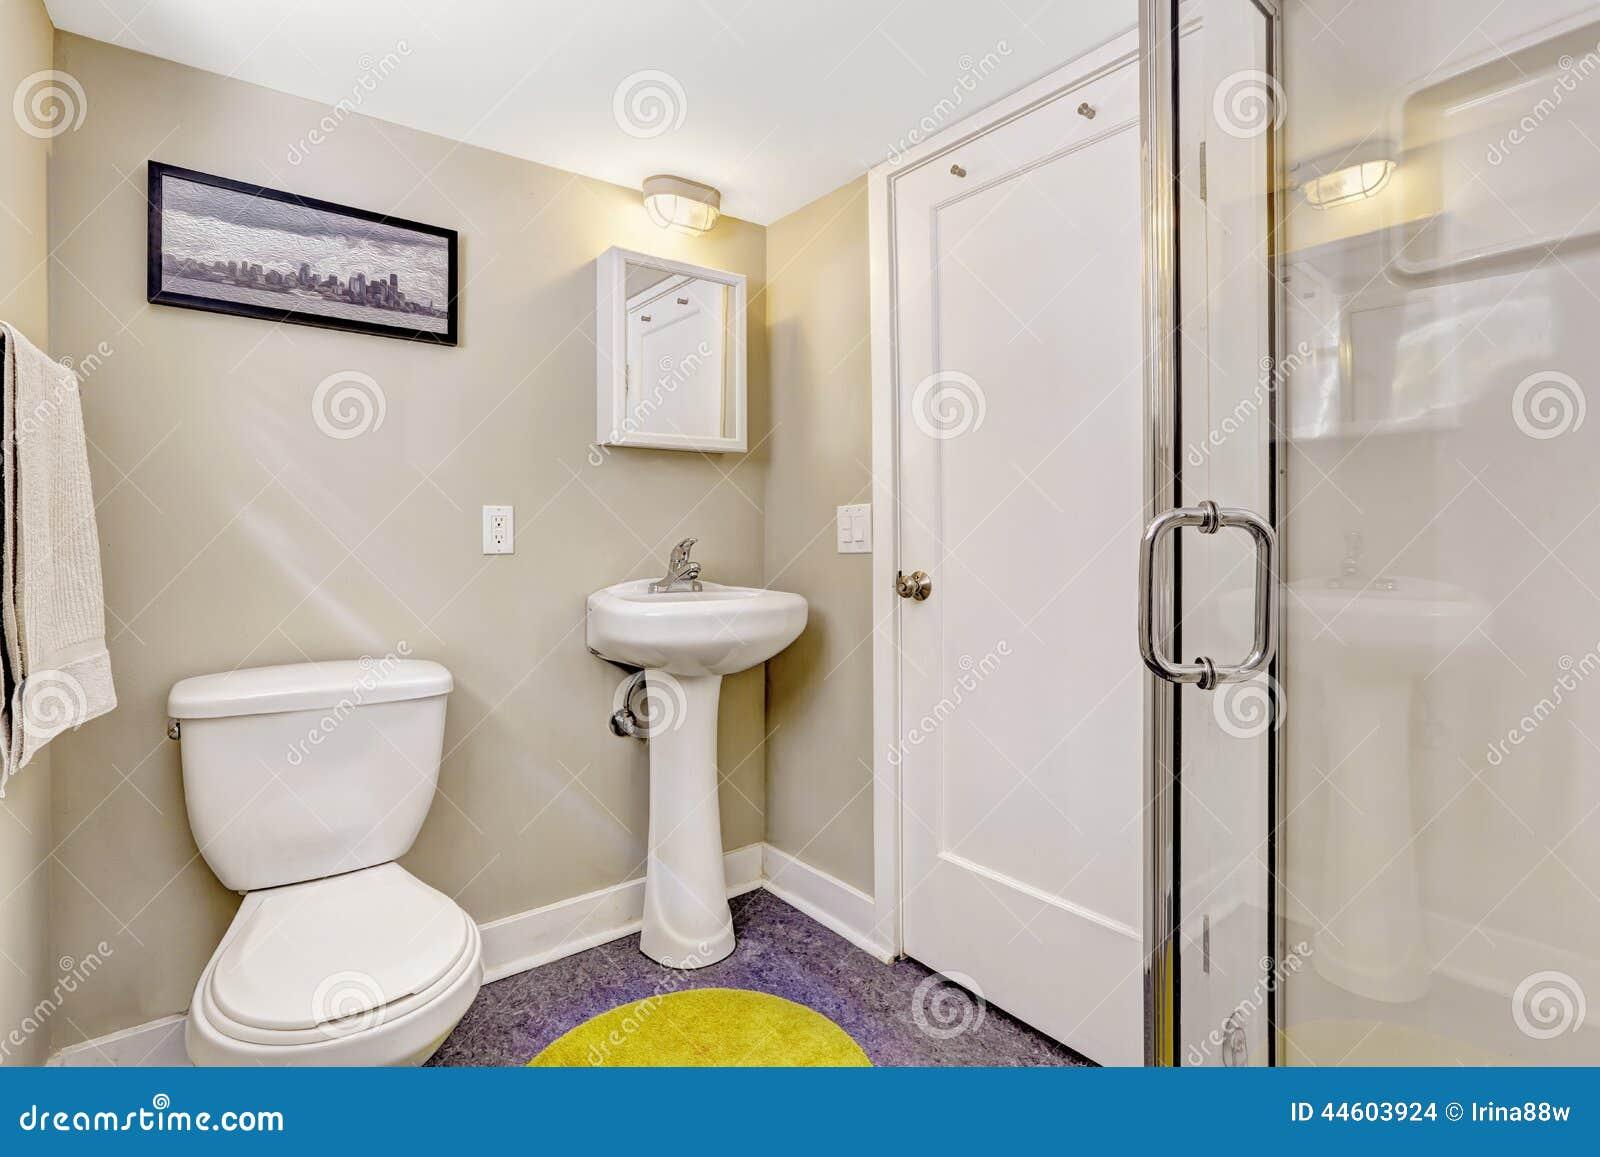 simple bathroom interior with purple floor and light beige walls